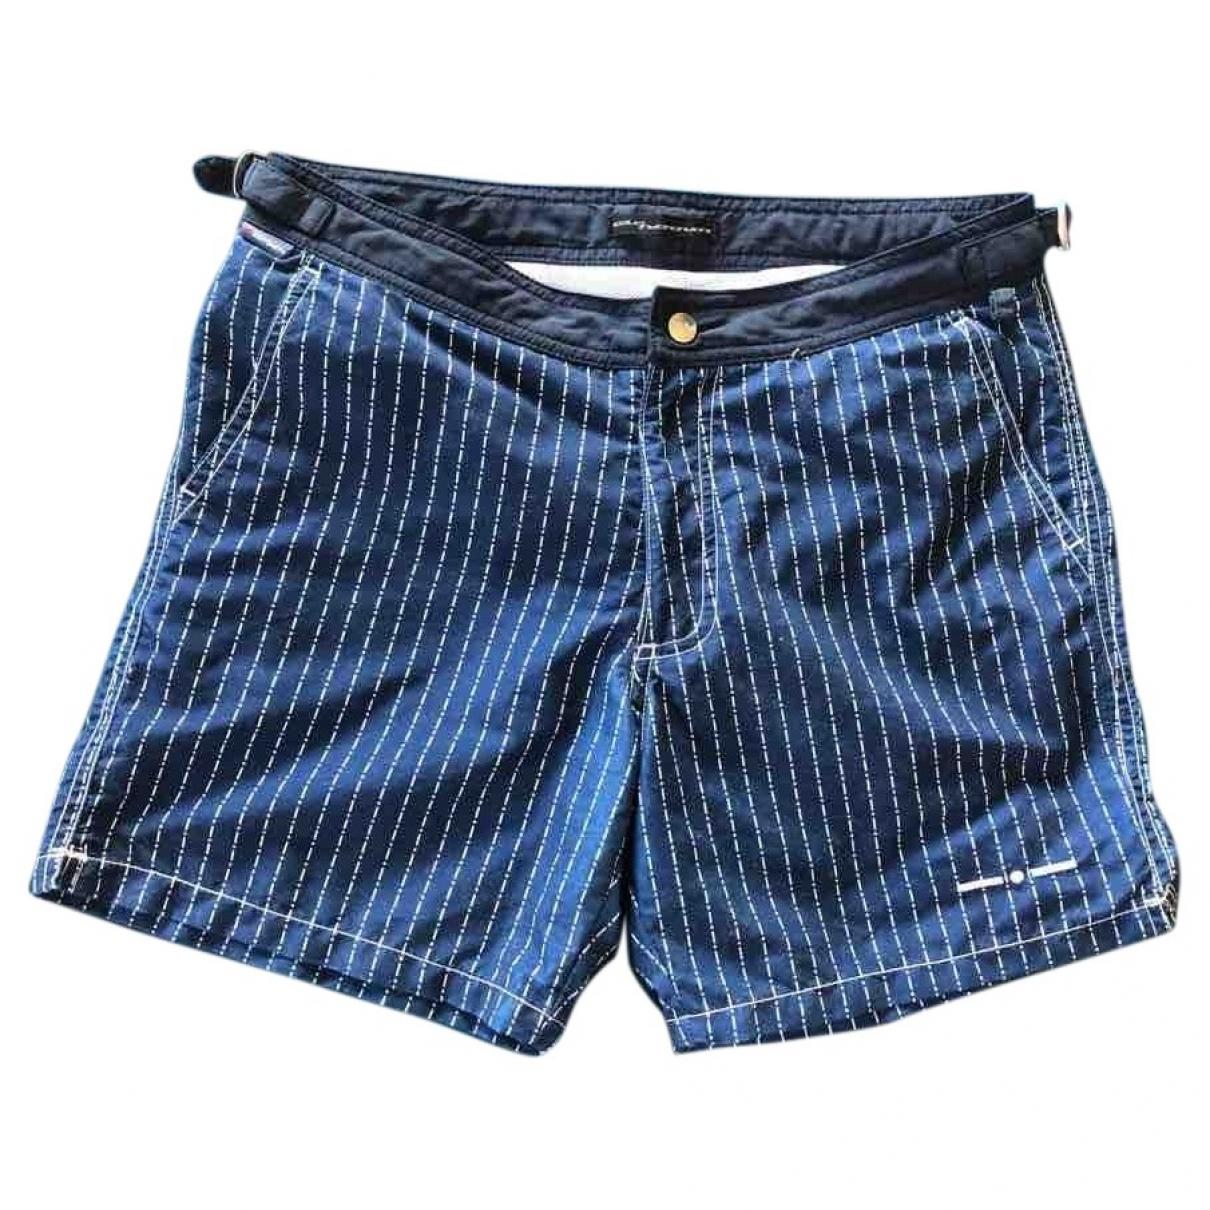 Mc2 Saint Barth \N Blue Cotton - elasthane Swimwear for Men S International